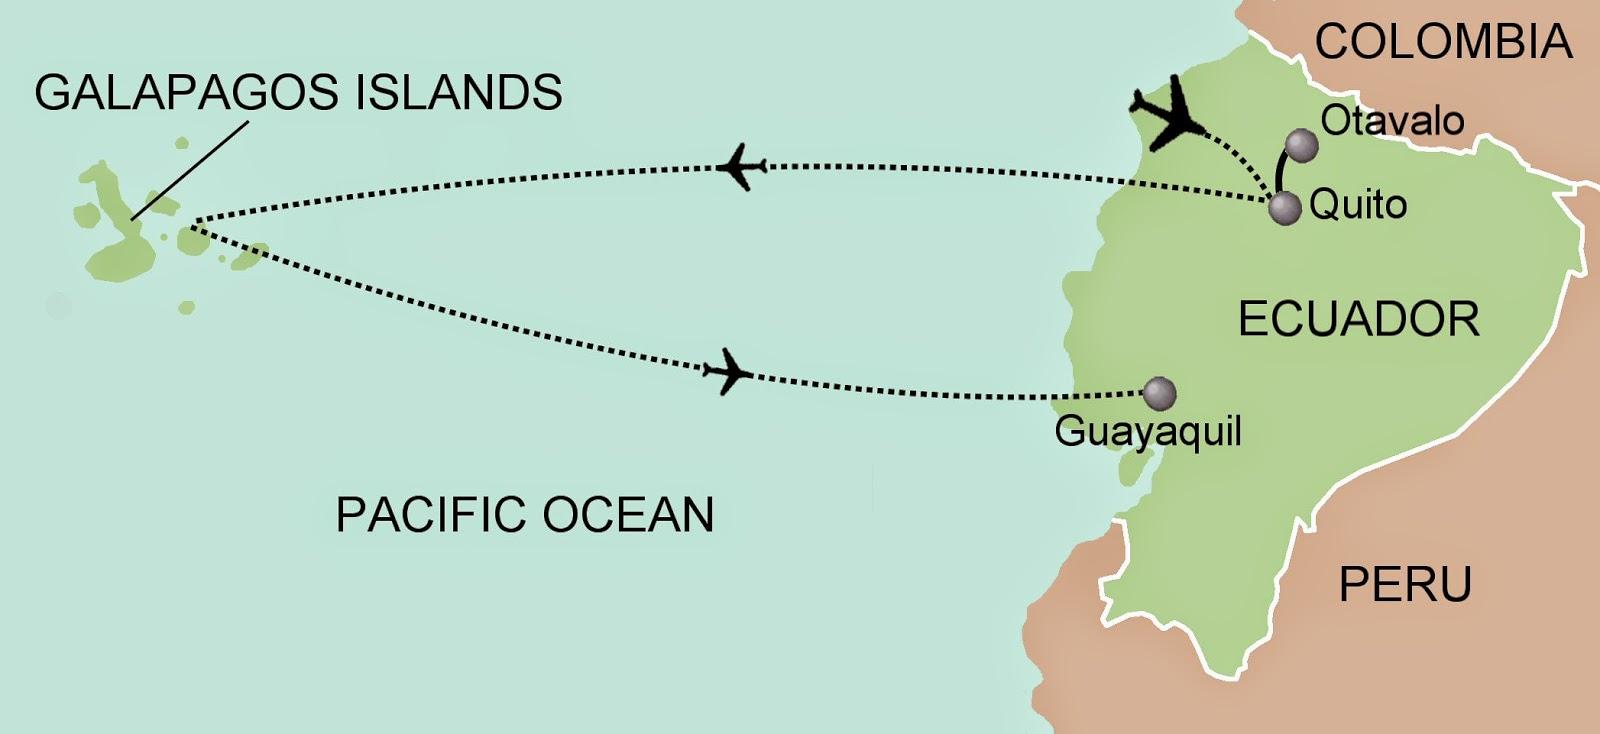 Galapagos On World Map.Map Galapagos Islands Free Printable Maps